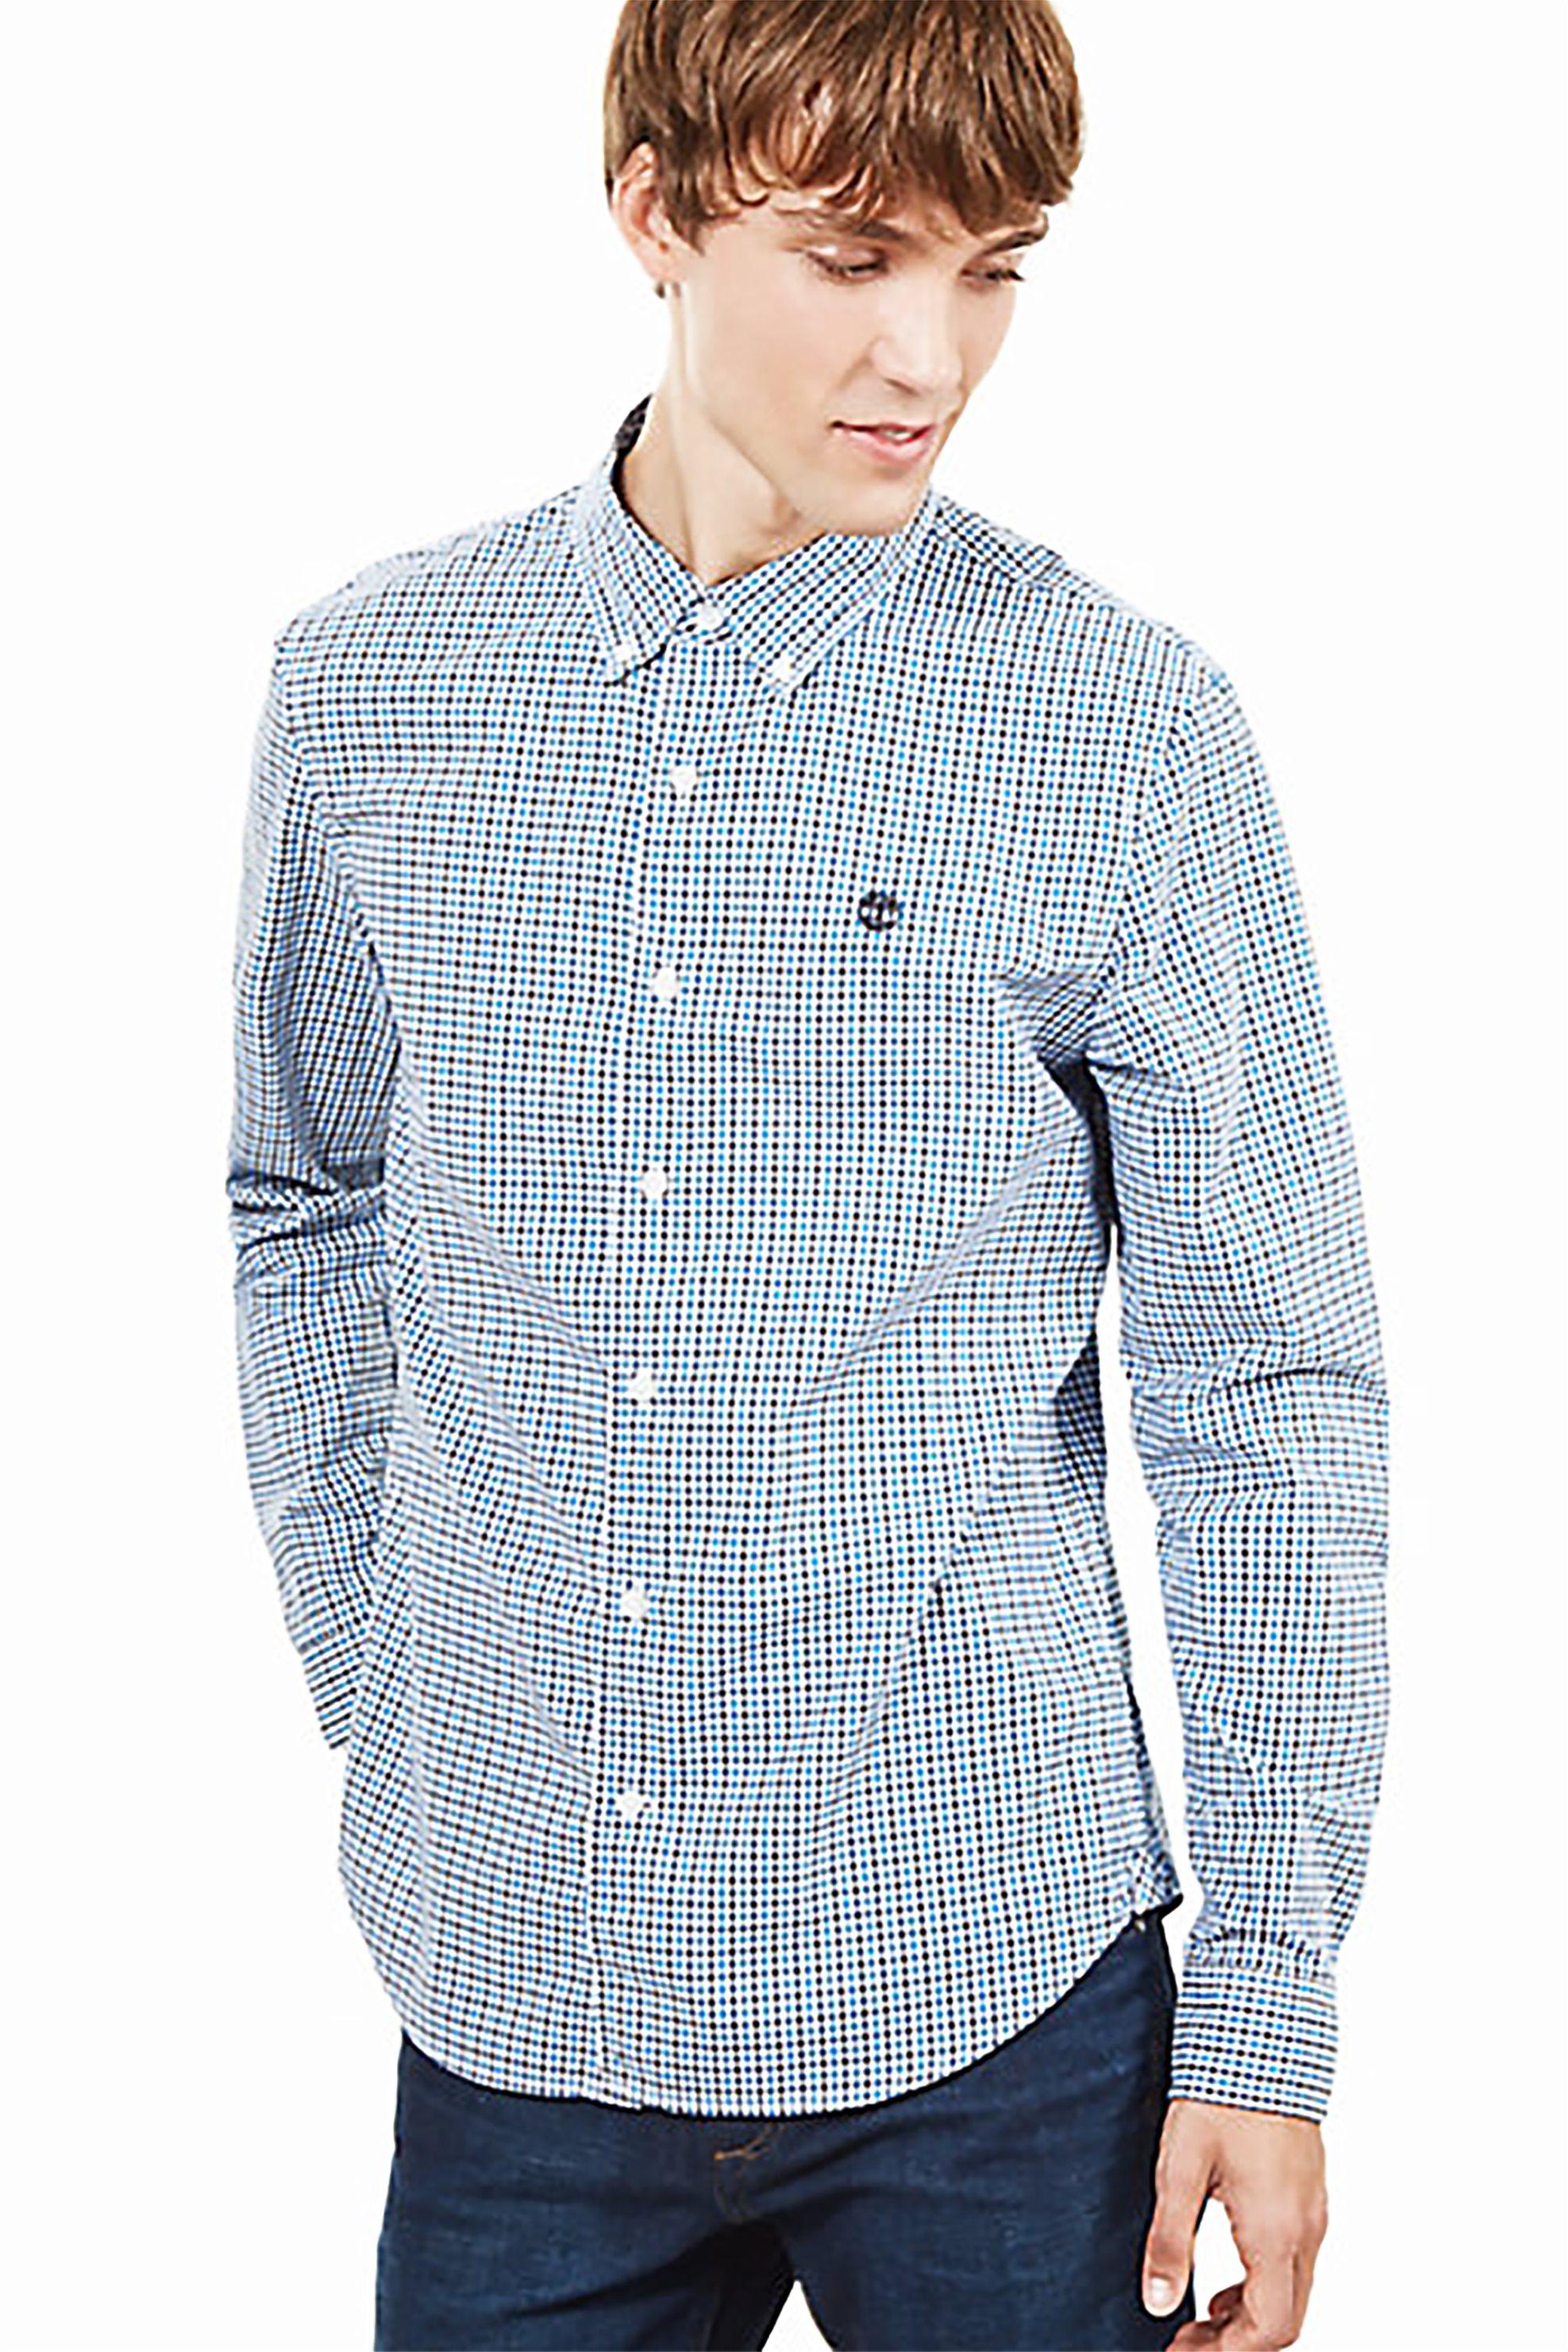 7b46c5af756b Notos Timberland ανδρικό καρό πουκάμισο Suncook - TB0A1ML2M781 - Γαλάζιο